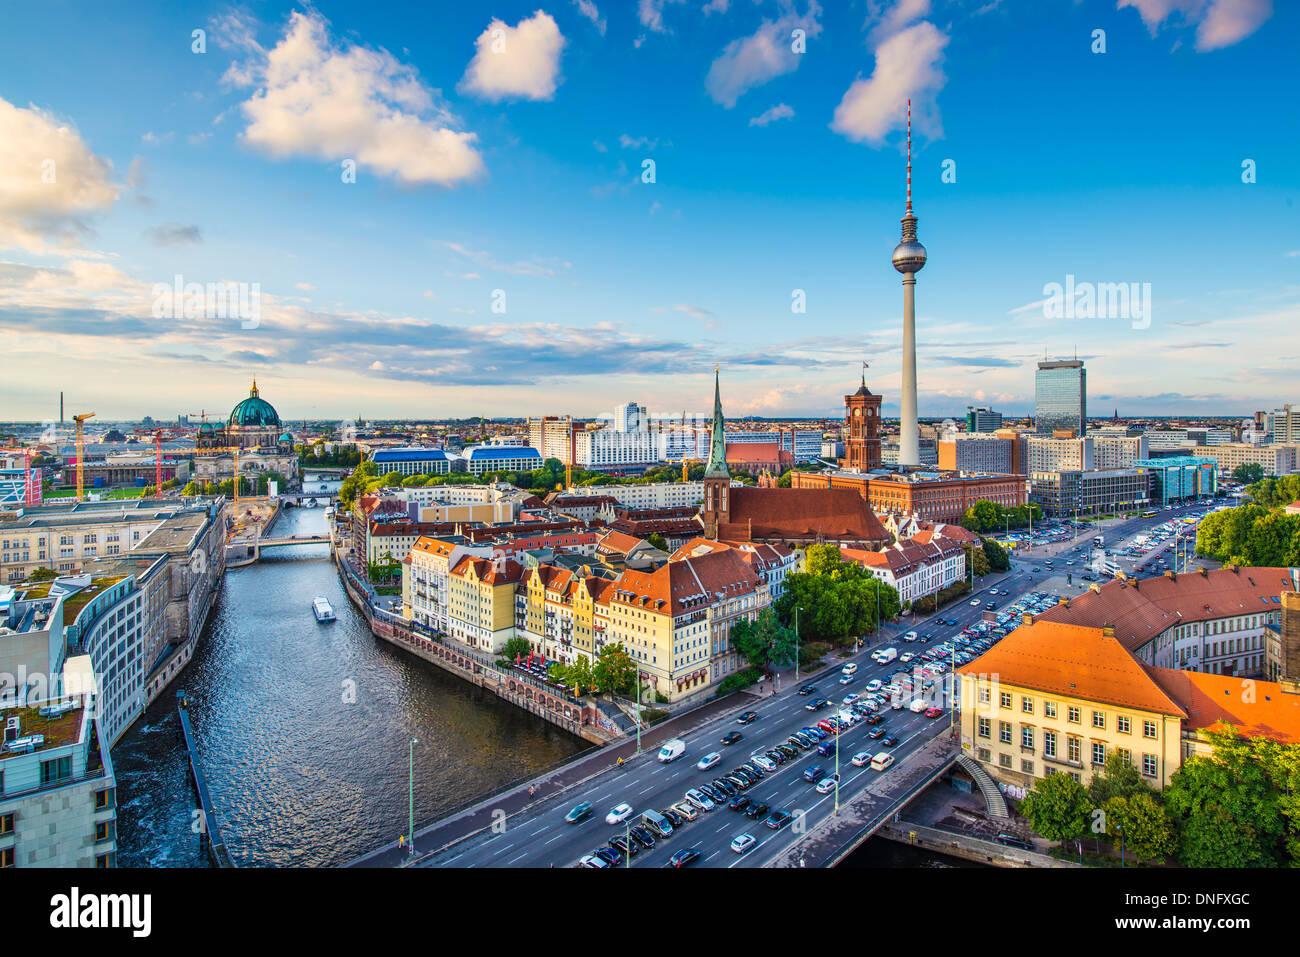 Berlin, Germany skyline over the Spree River. Stock Photo